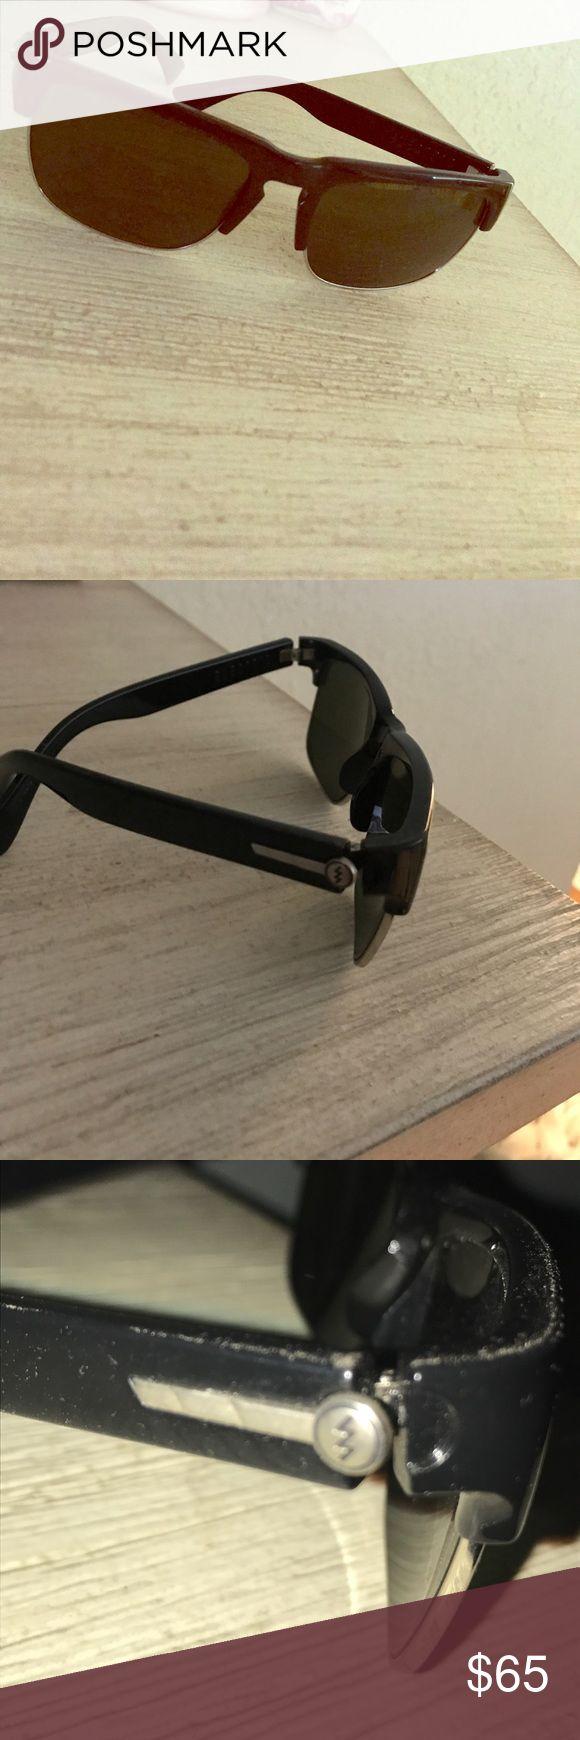 Electric sunglasses Like new Electric brand sunglasses Accessories Sunglasses